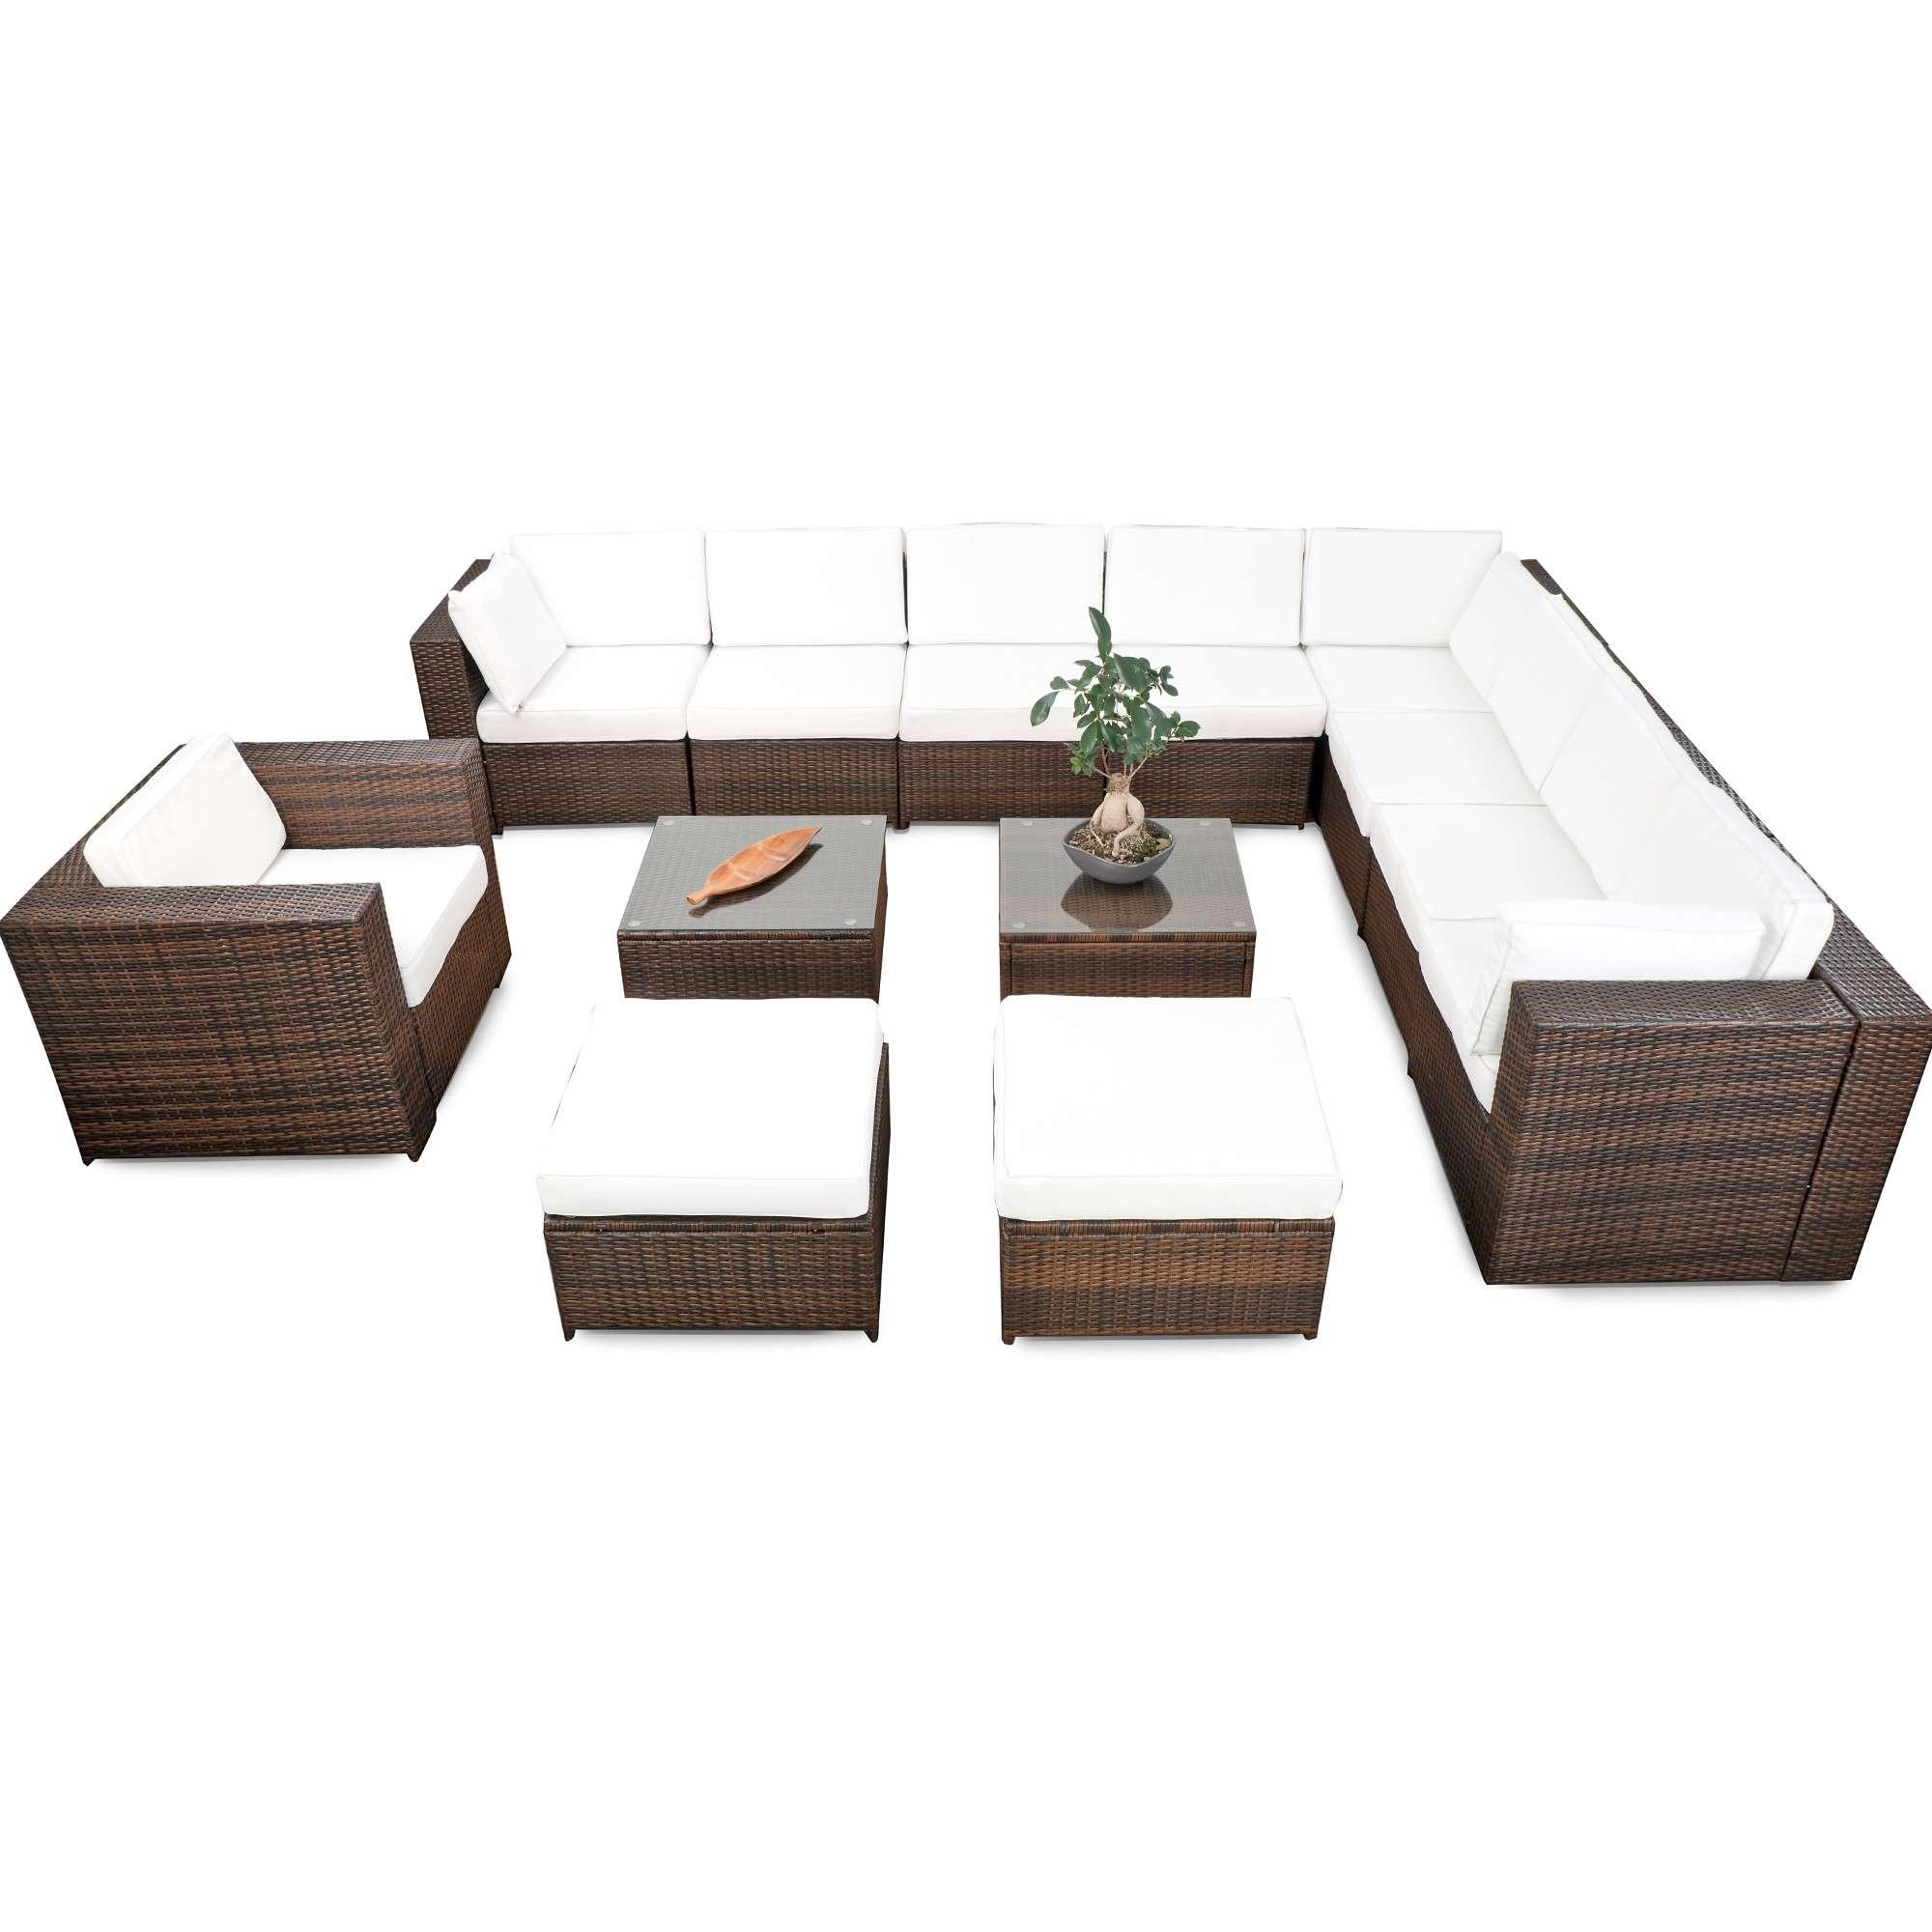 Strandkörbe und Gartenmöbel ✓ Sitzgruppen ✓ Polyrattan ✓ Holz ...